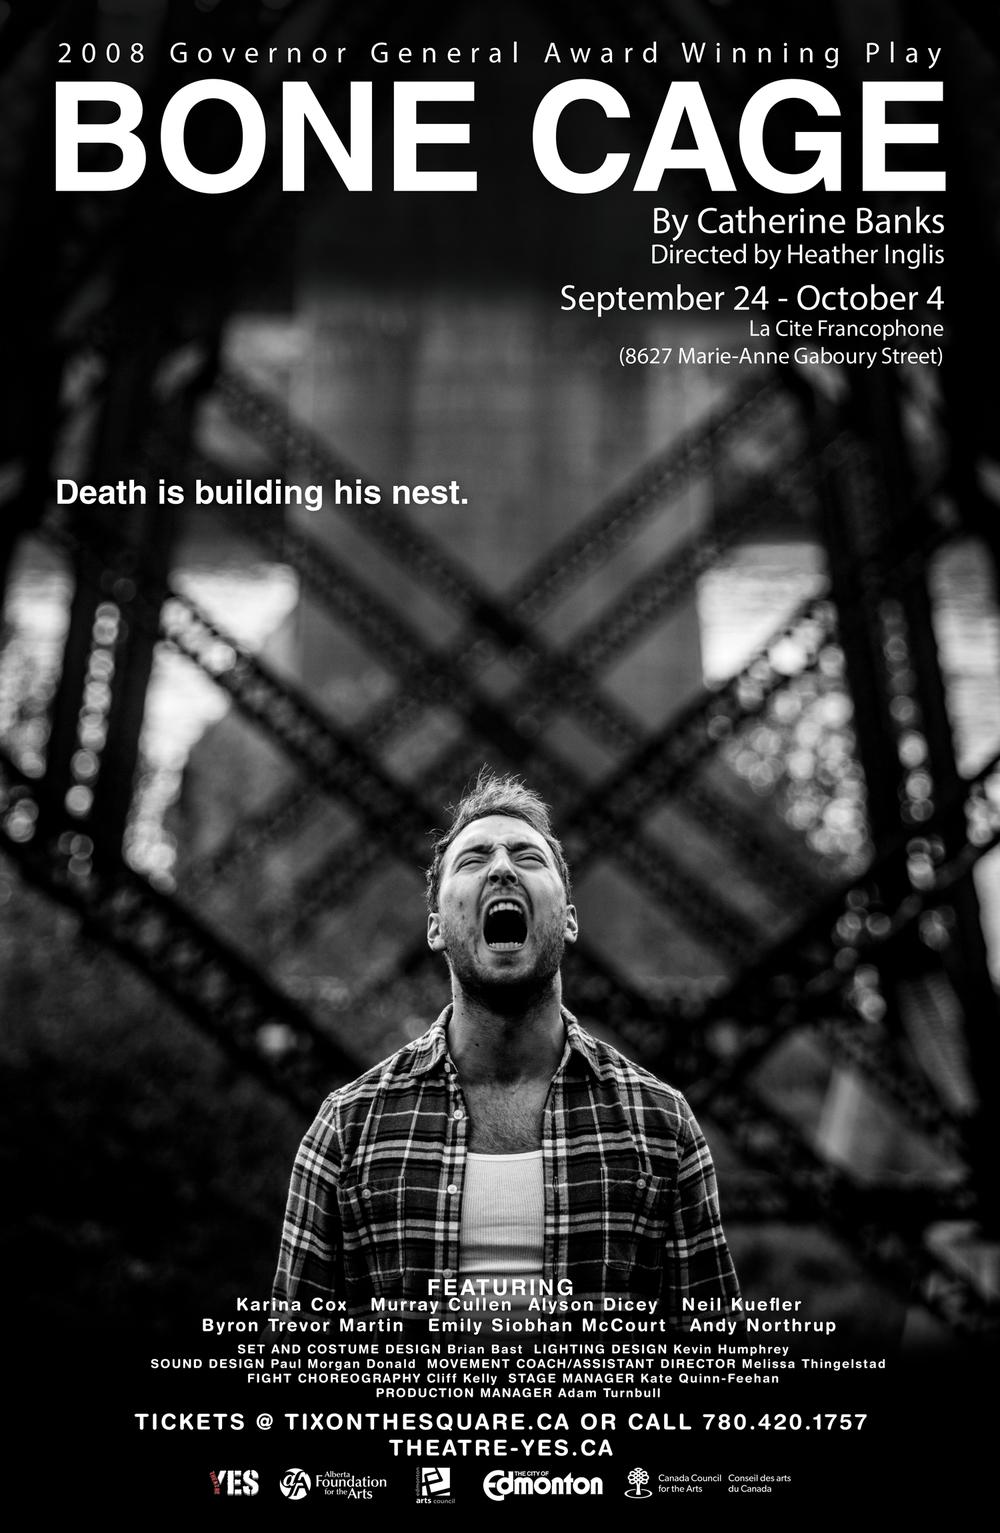 Bone-Cage-Poster---Web.jpg